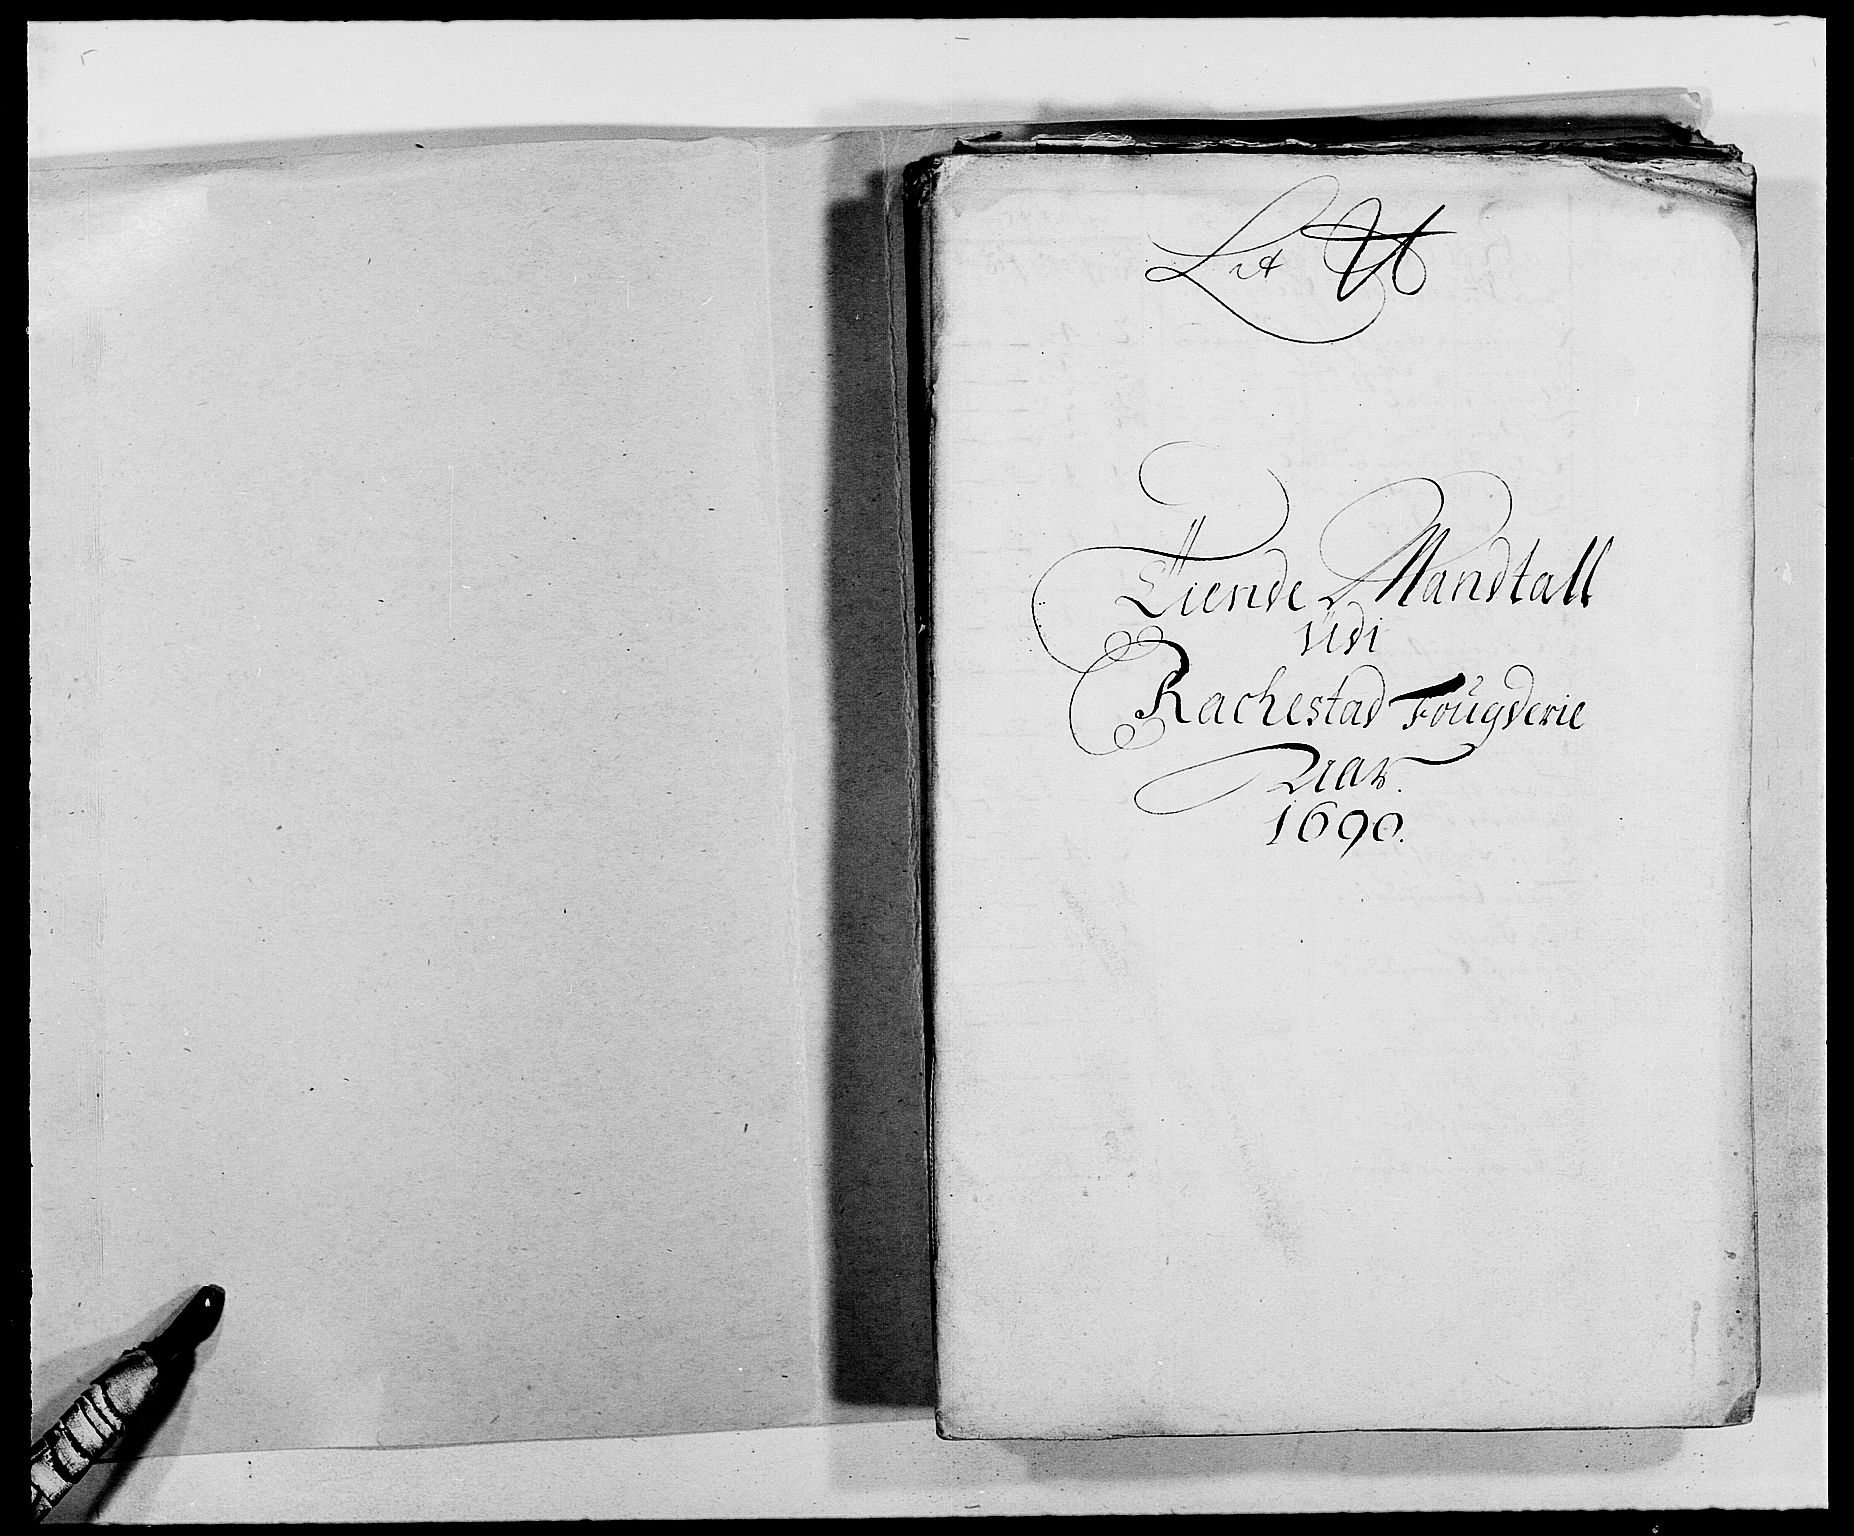 RA, Rentekammeret inntil 1814, Reviderte regnskaper, Fogderegnskap, R05/L0277: Fogderegnskap Rakkestad, 1689-1690, s. 156